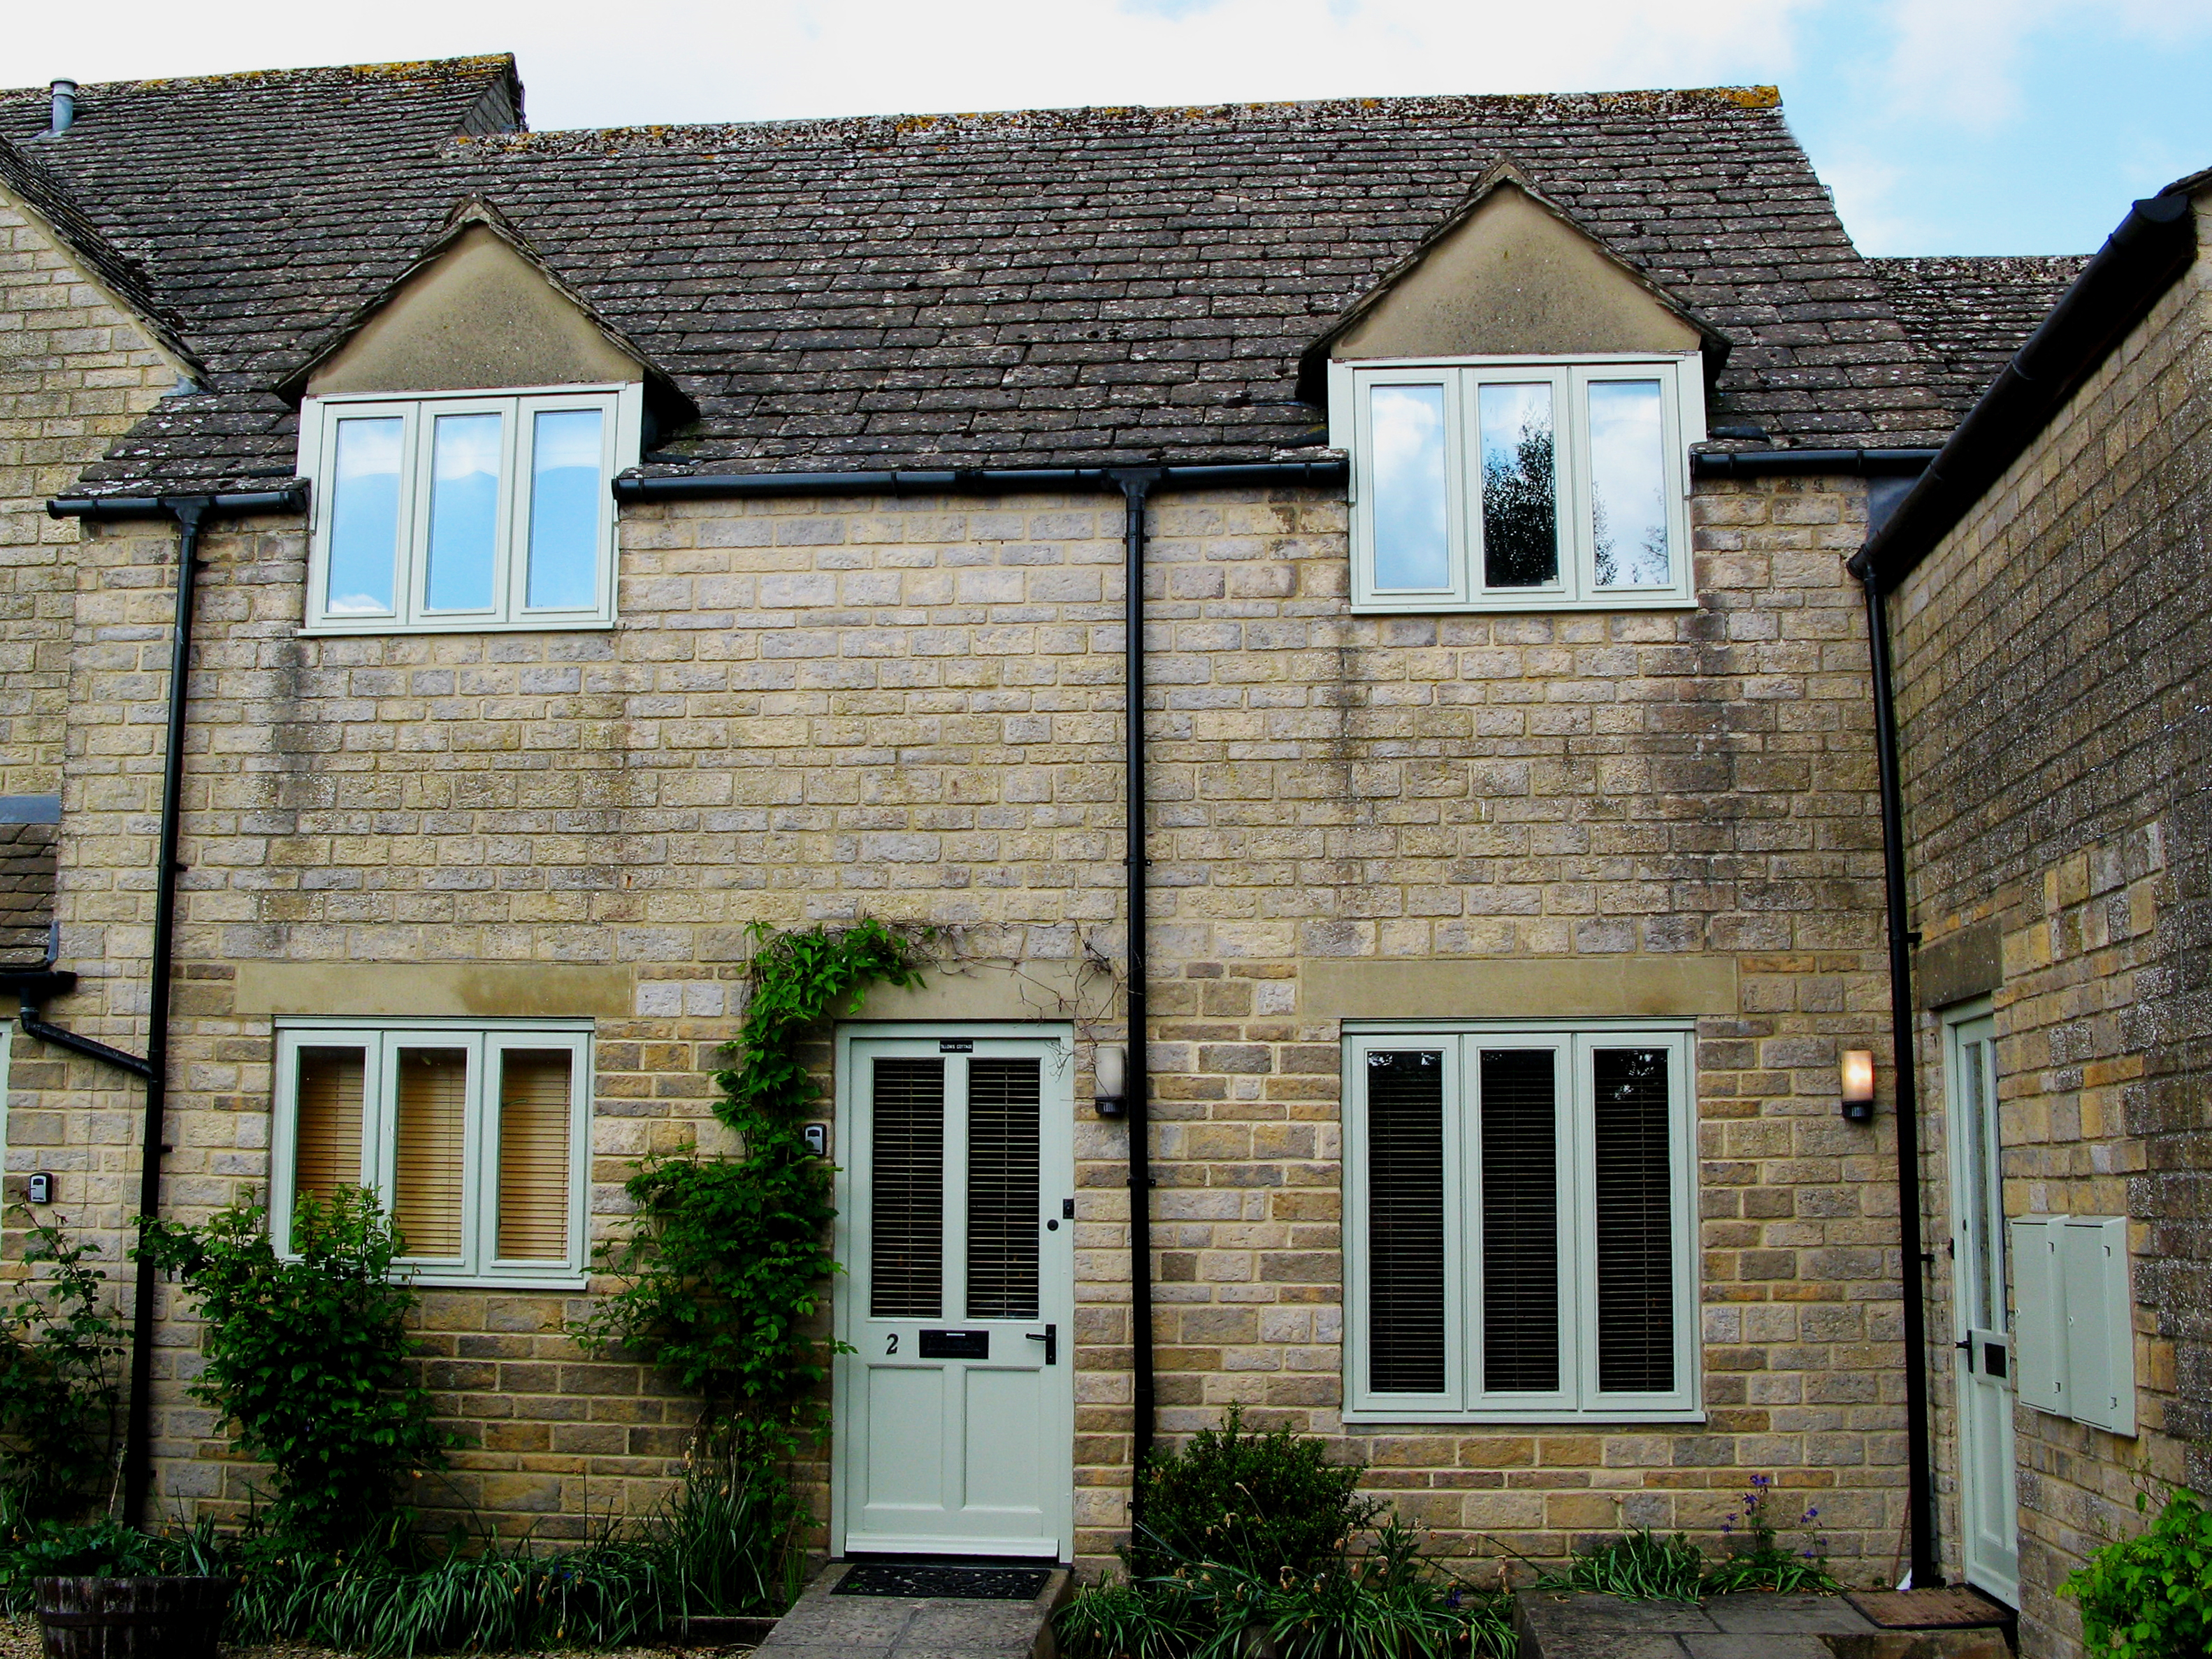 Tillows Cottage, Bibury